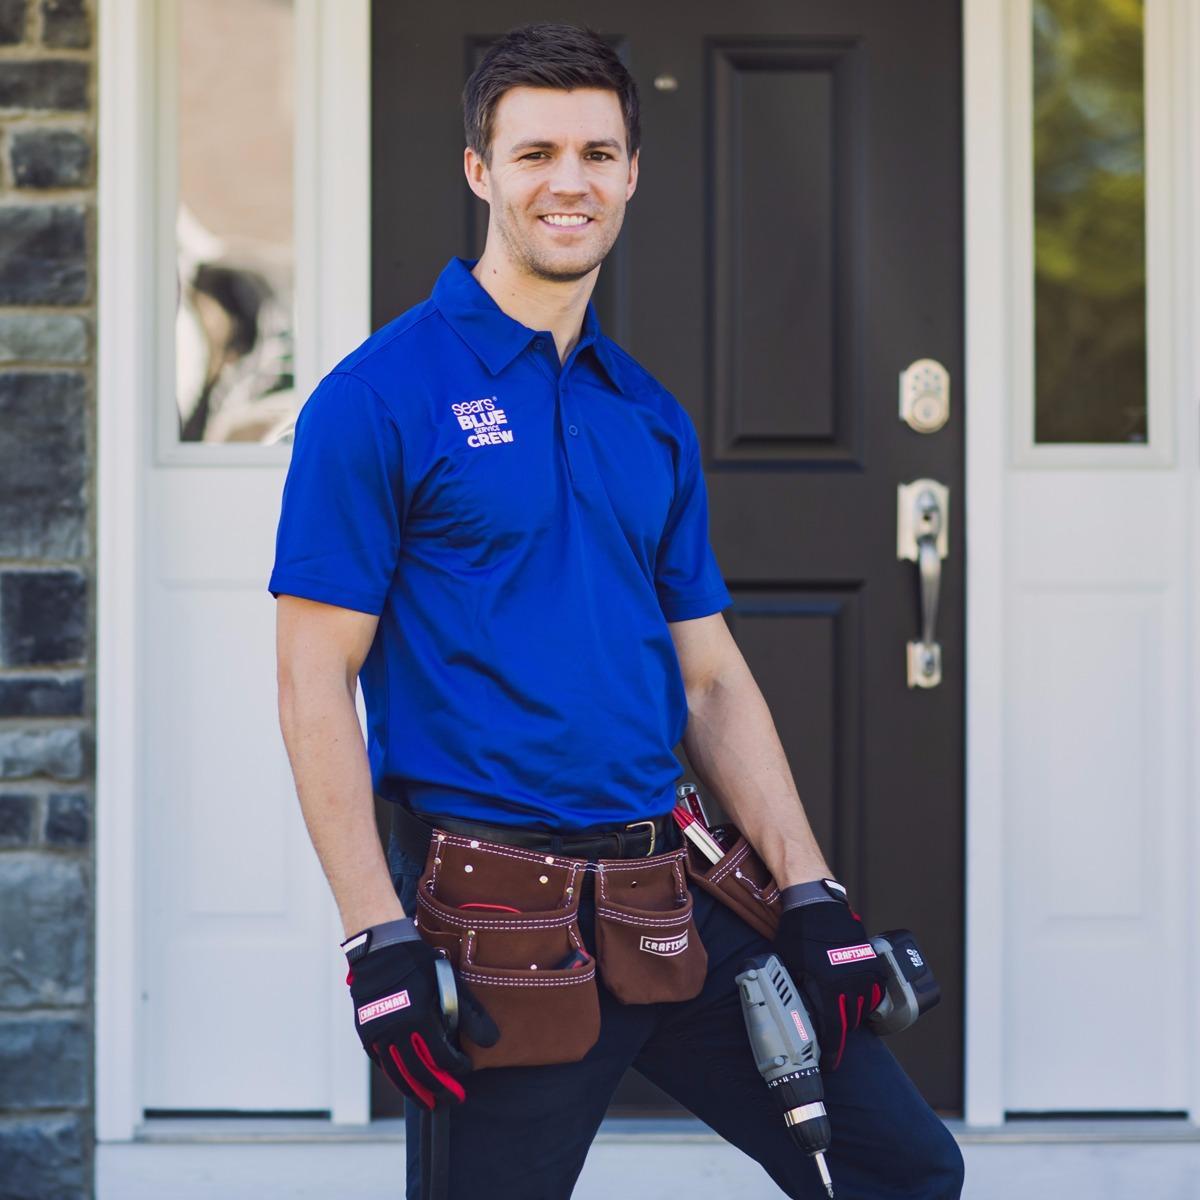 Sears Handyman Solutions image 5